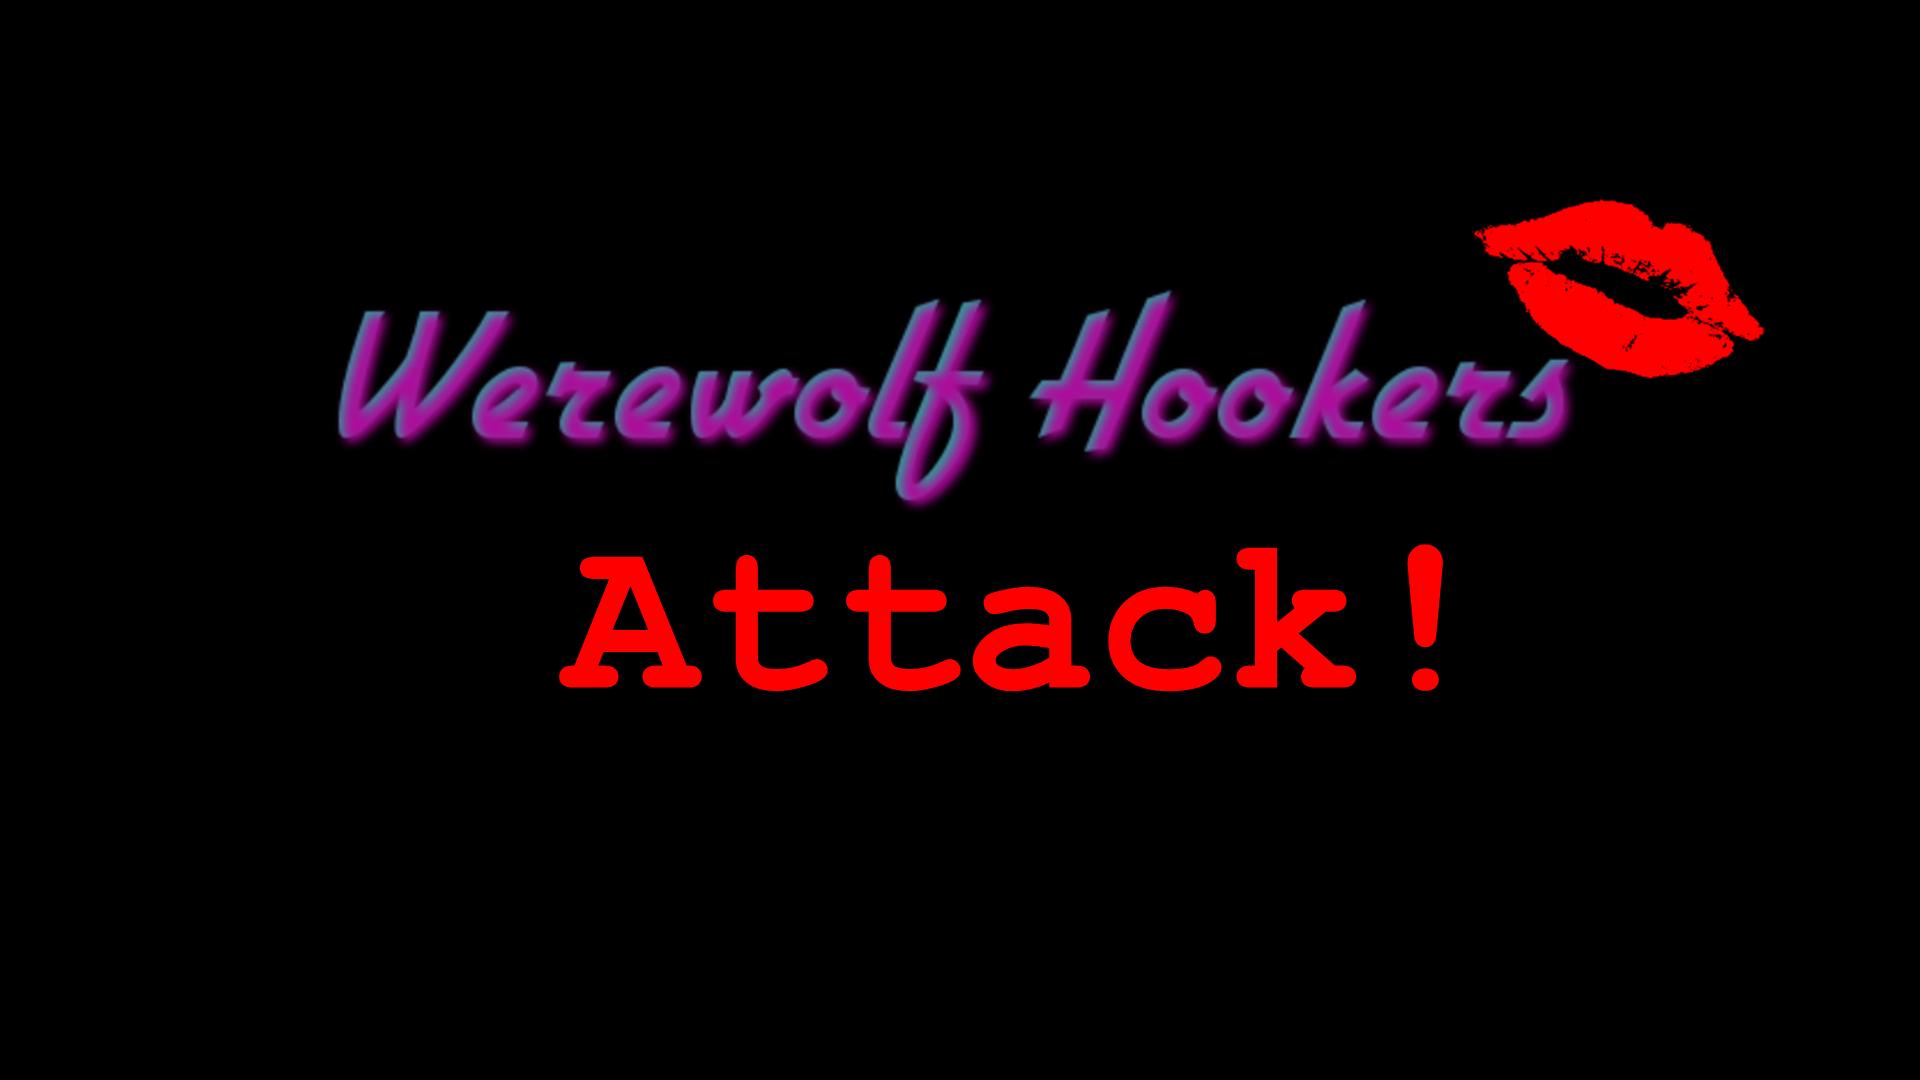 """Werewolf Hookers Attack!"""